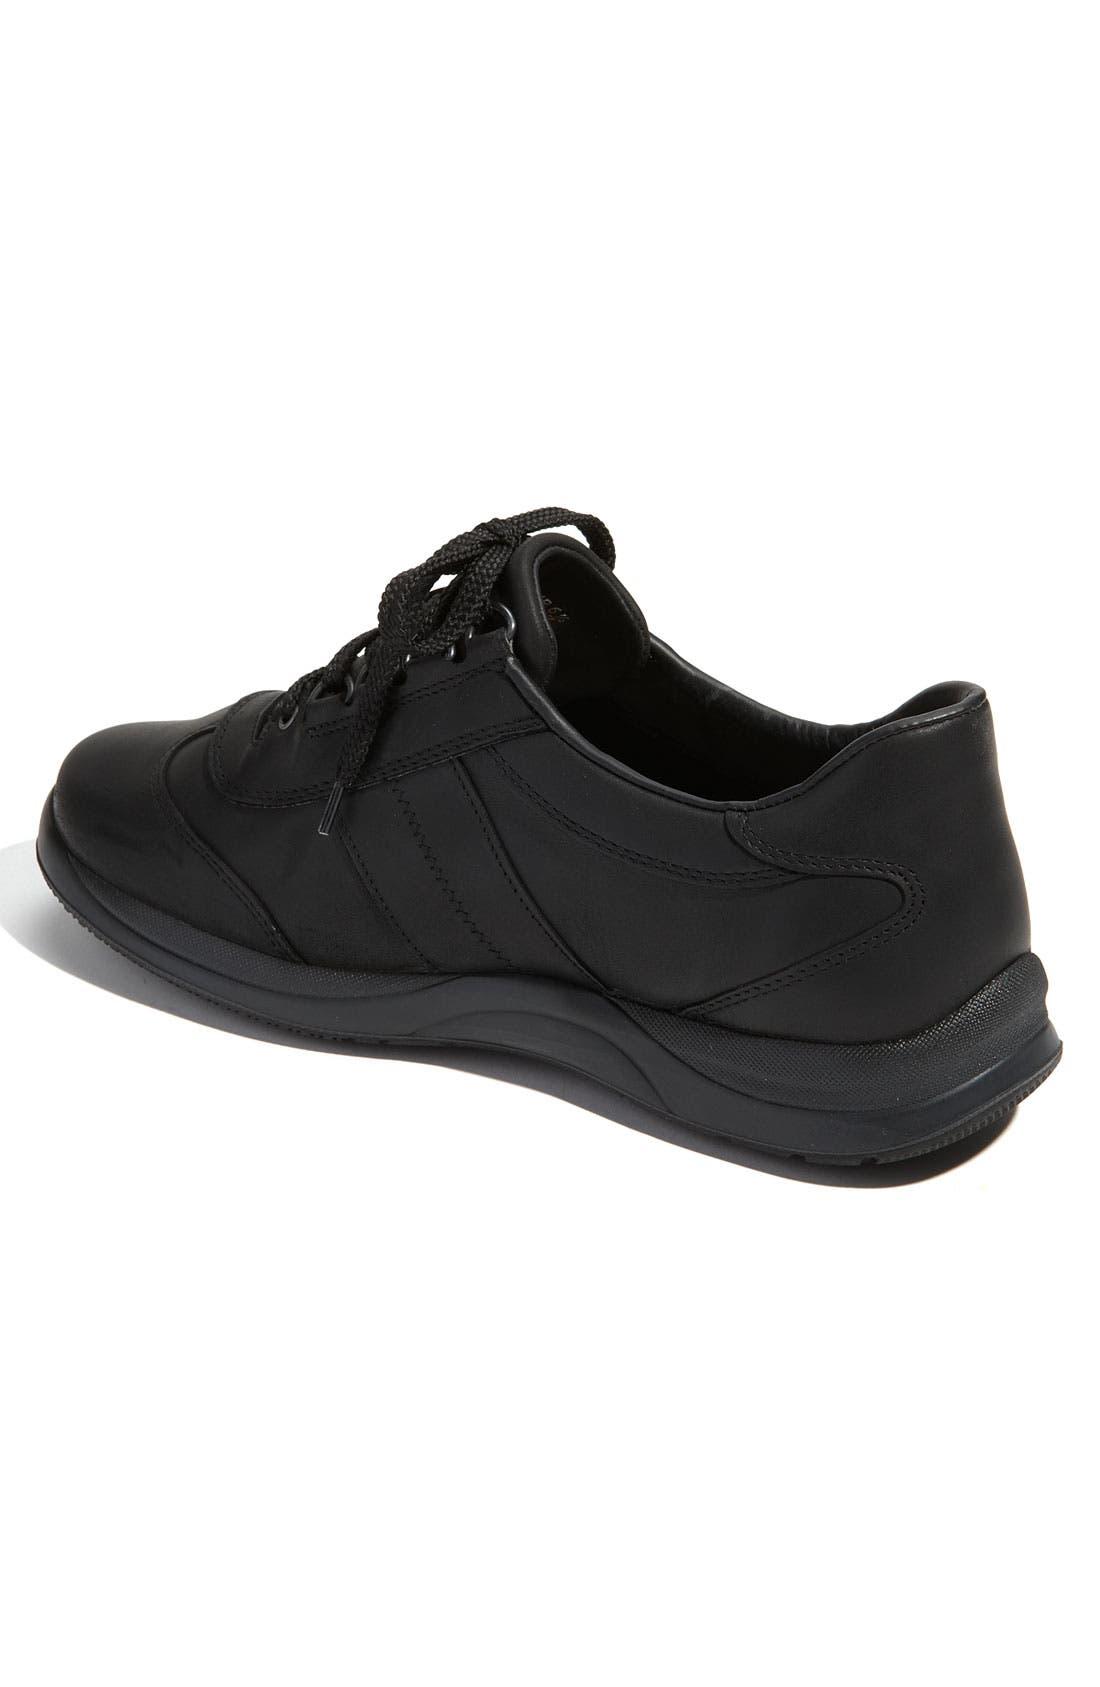 Alternate Image 2  - Mephisto 'Hike' Walking Shoe (Men)